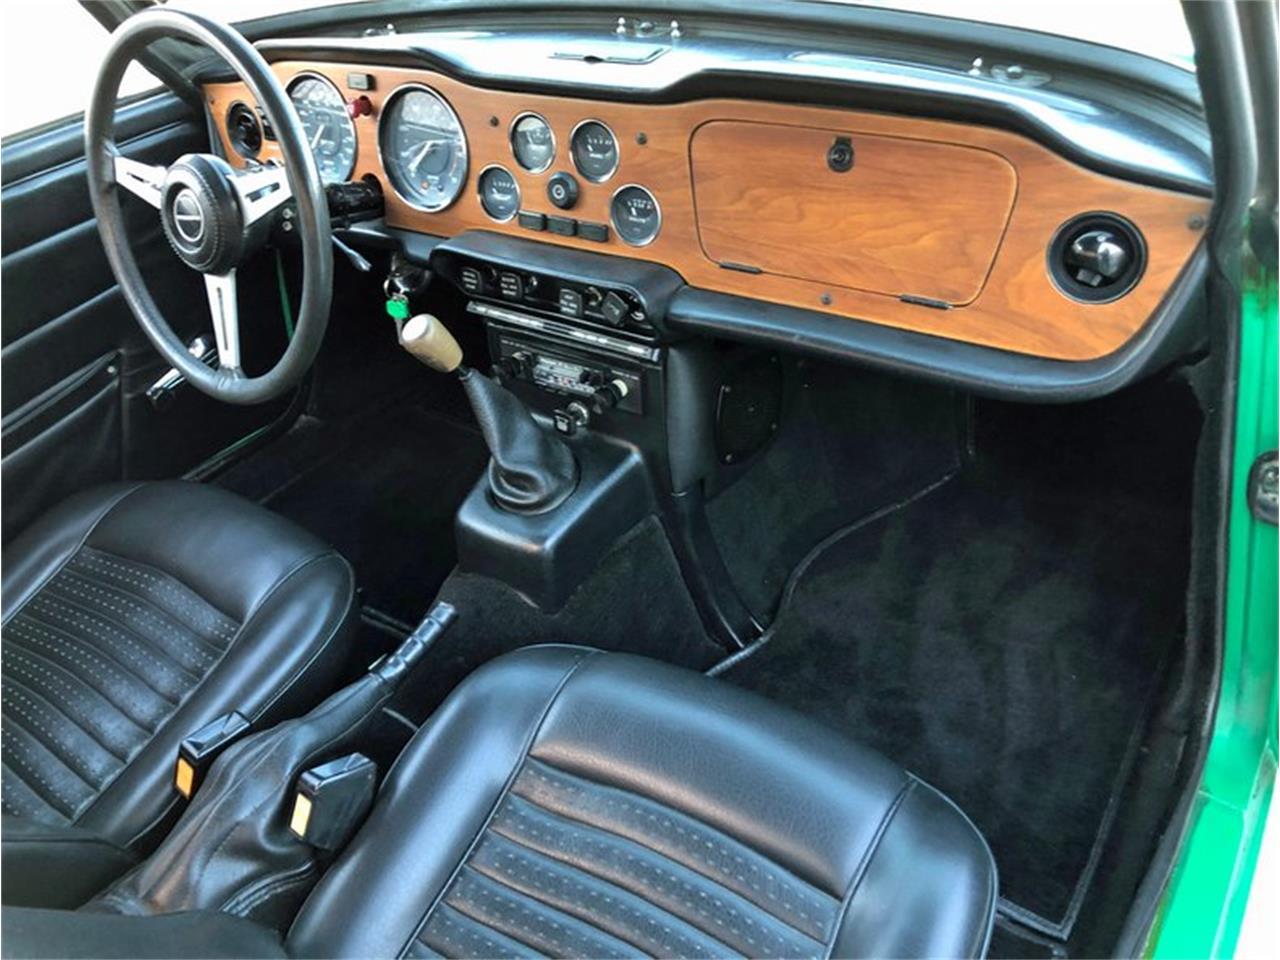 1976 Triumph TR6 (CC-1230988) for sale in West Chester, Pennsylvania